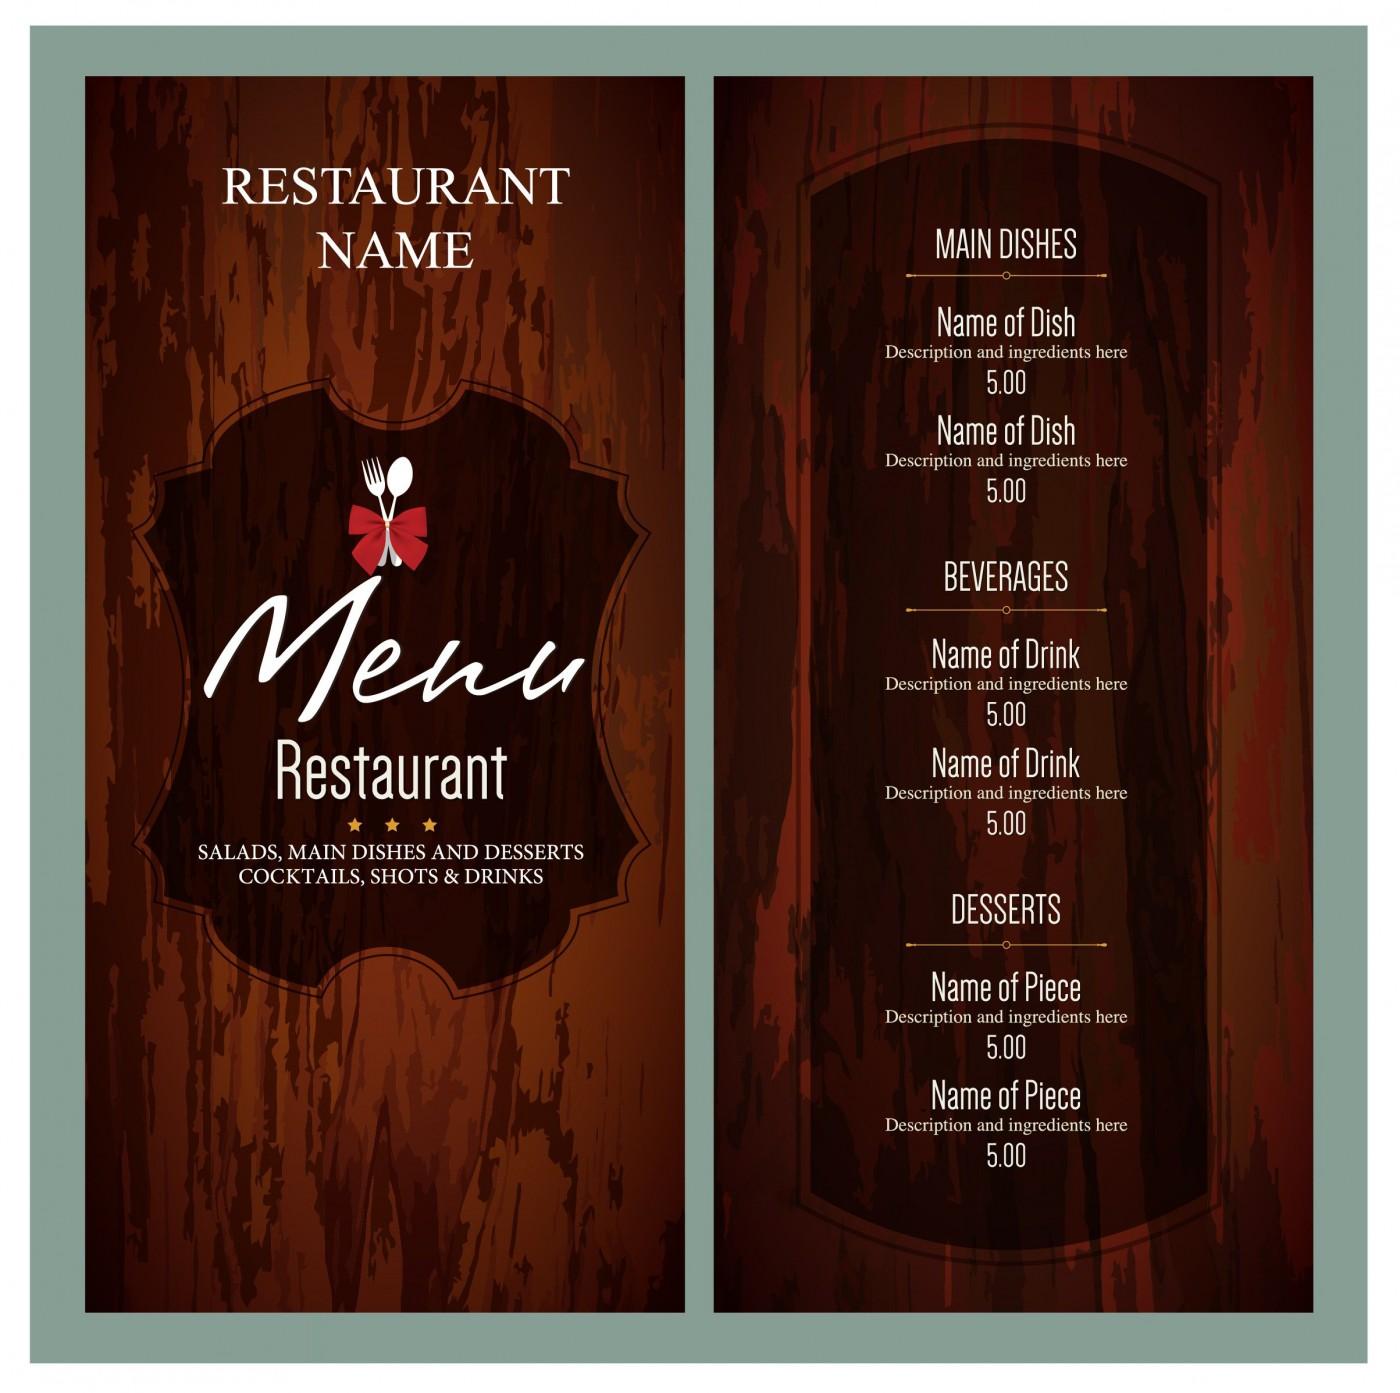 010 Unusual Free Menu Template Download High Resolution  Beauty Parlour Card Html Design Restaurant1400